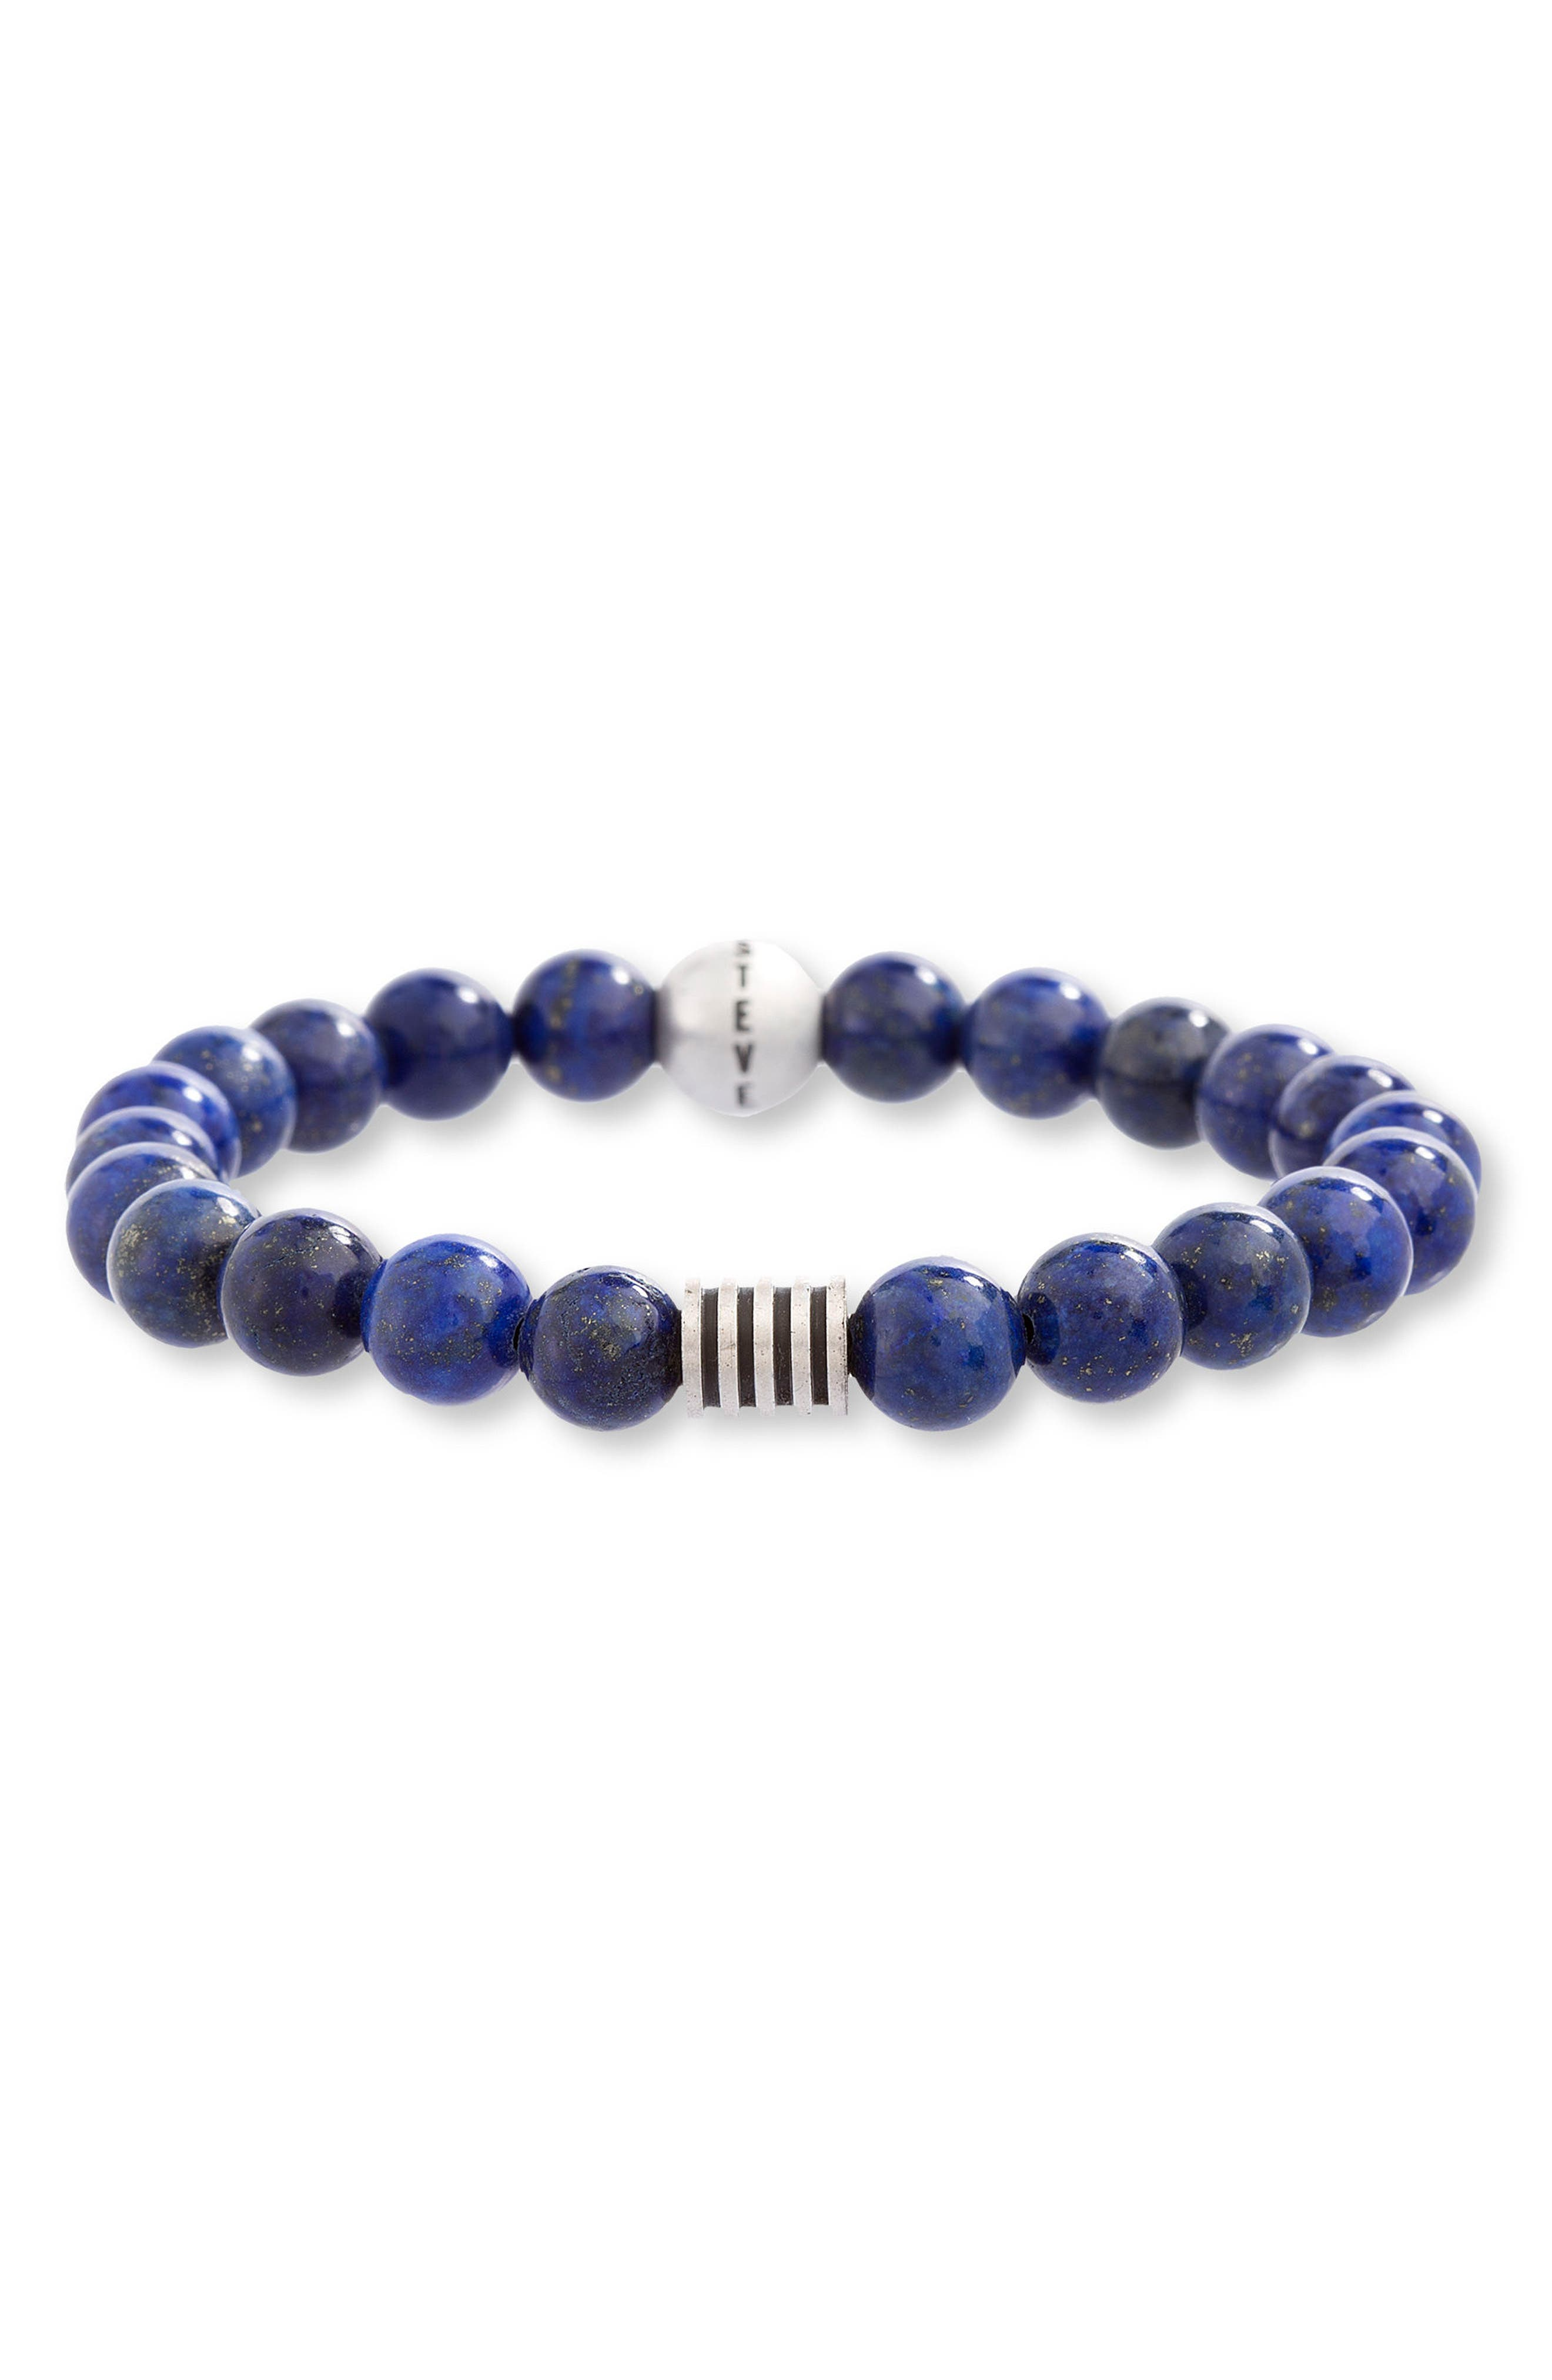 Lapis Lazuli Bead Bracelet,                             Alternate thumbnail 2, color,